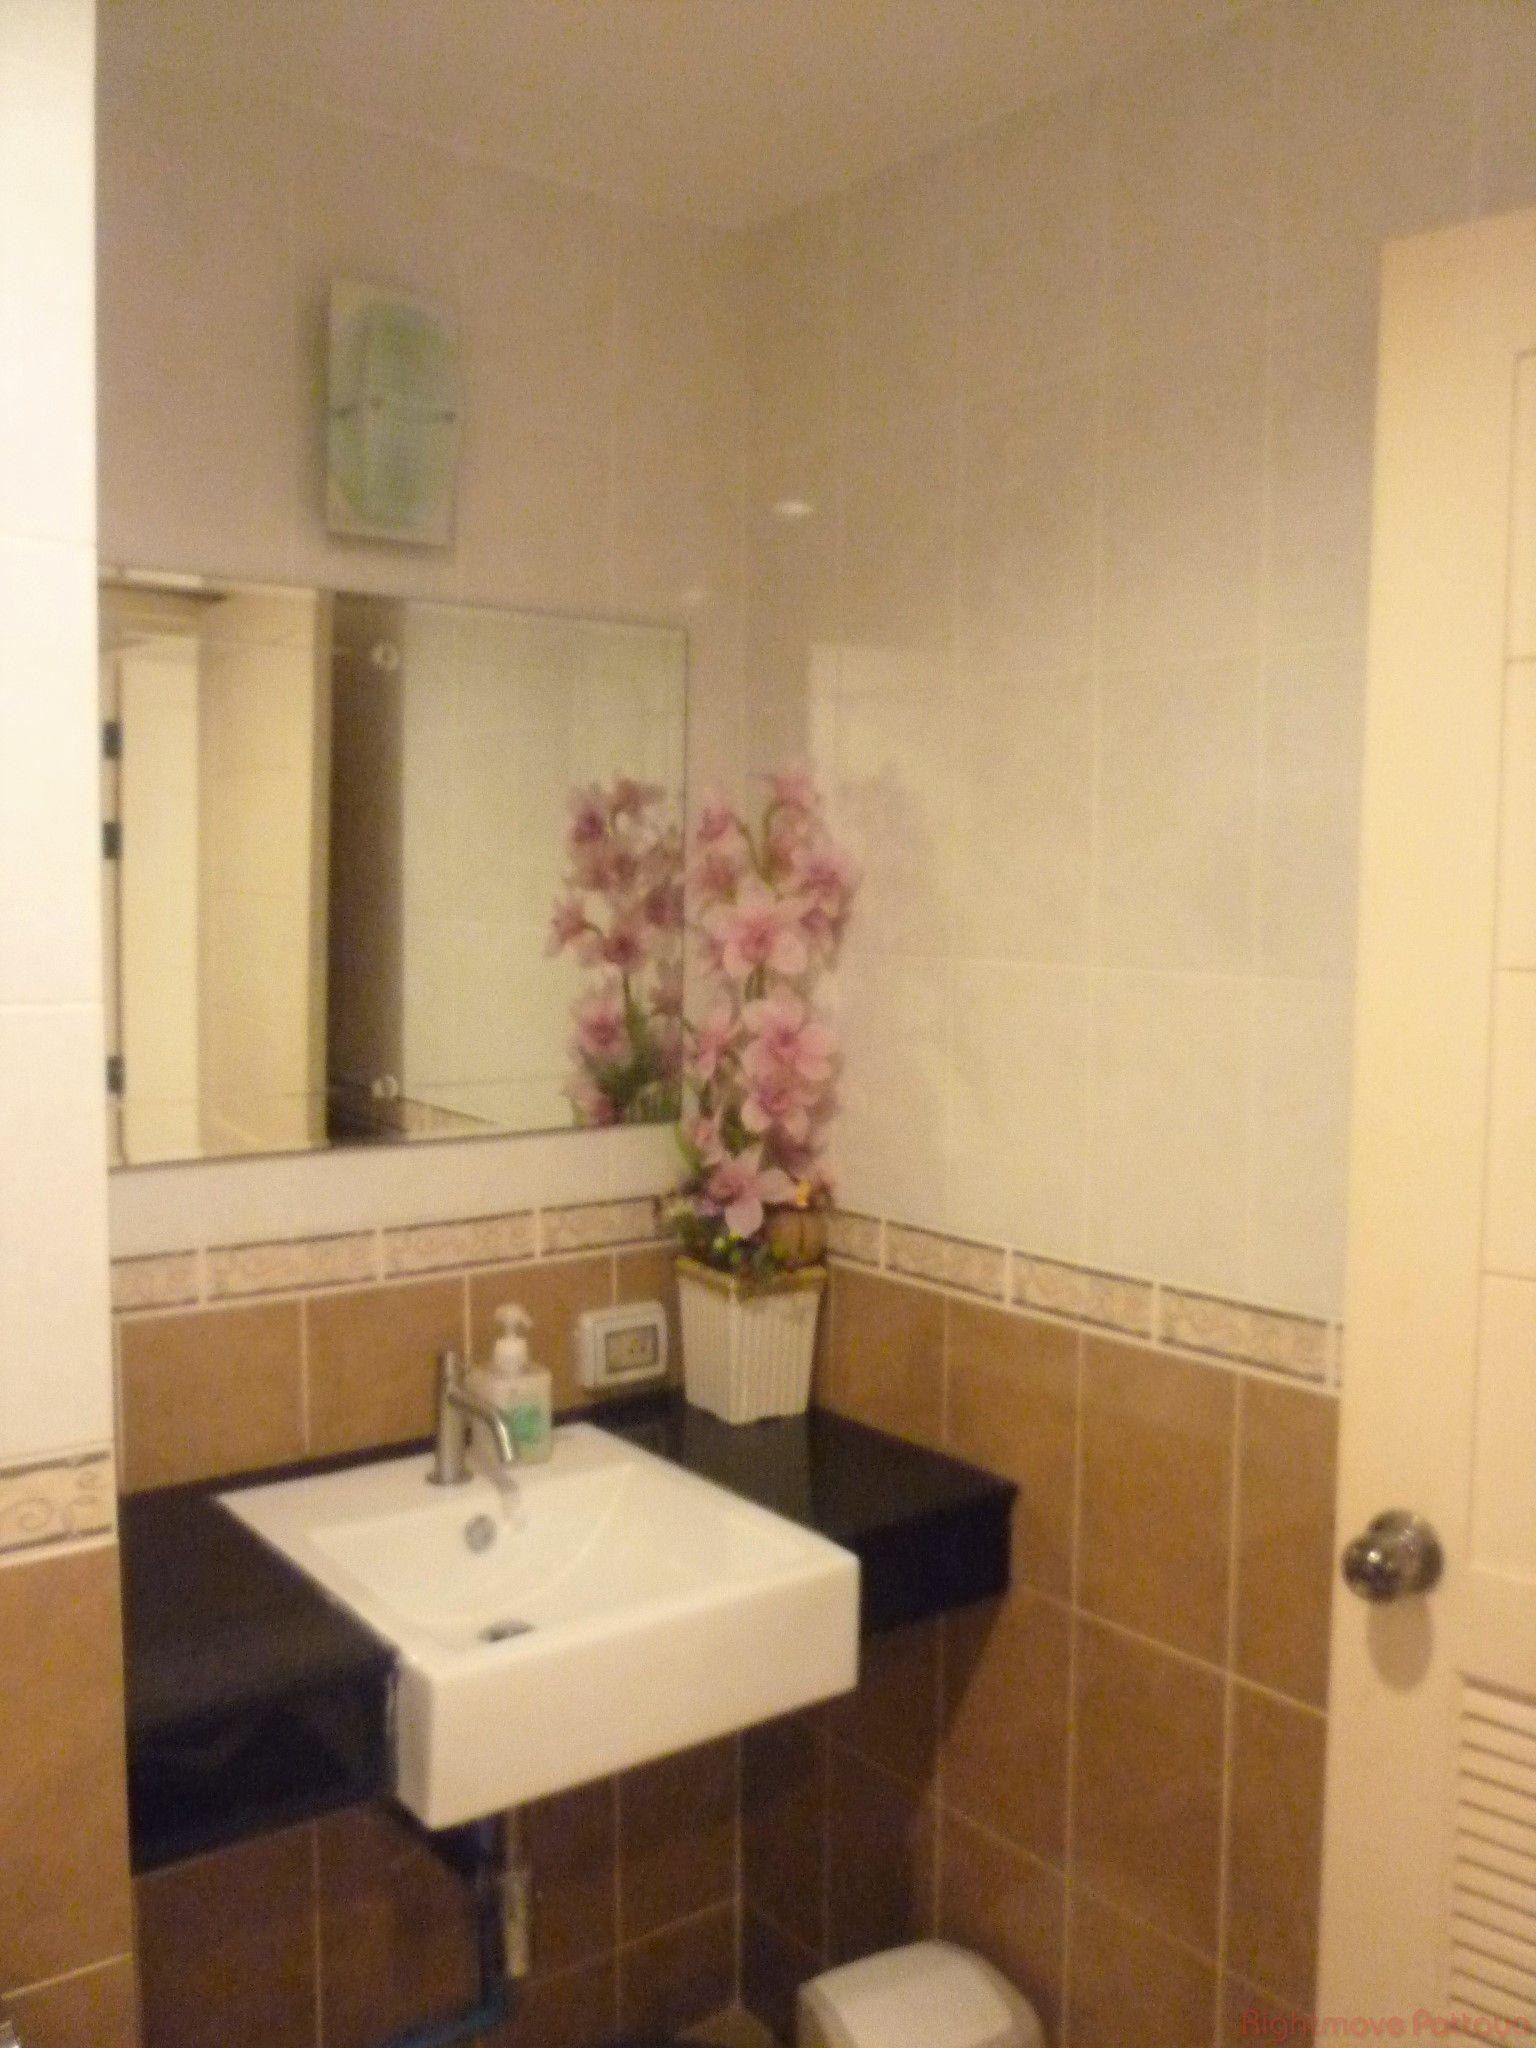 pic-6-Rightmove Pattaya Porchland 2 Jomtien Resort Condominiums for sale in Jomtien Pattaya